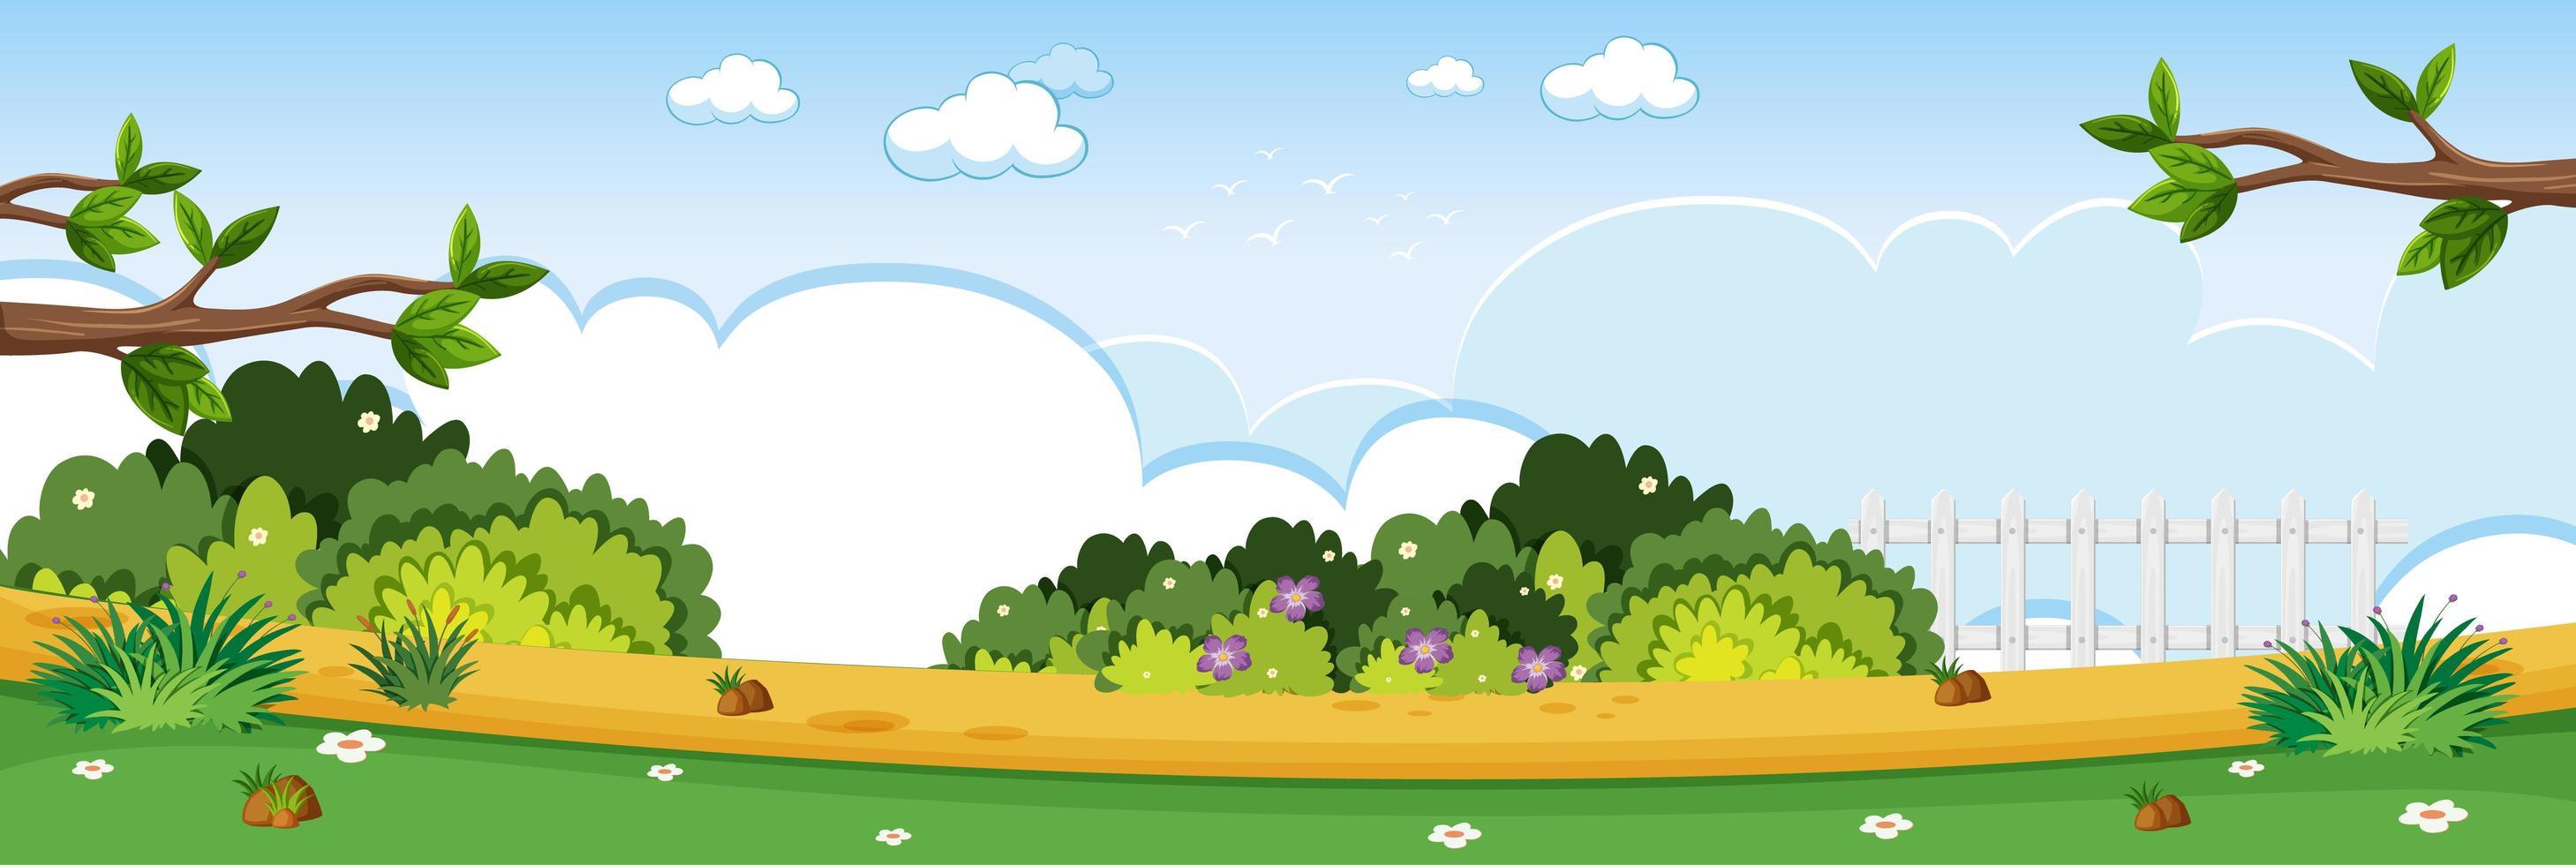 Blank nature park horizontal scene vector